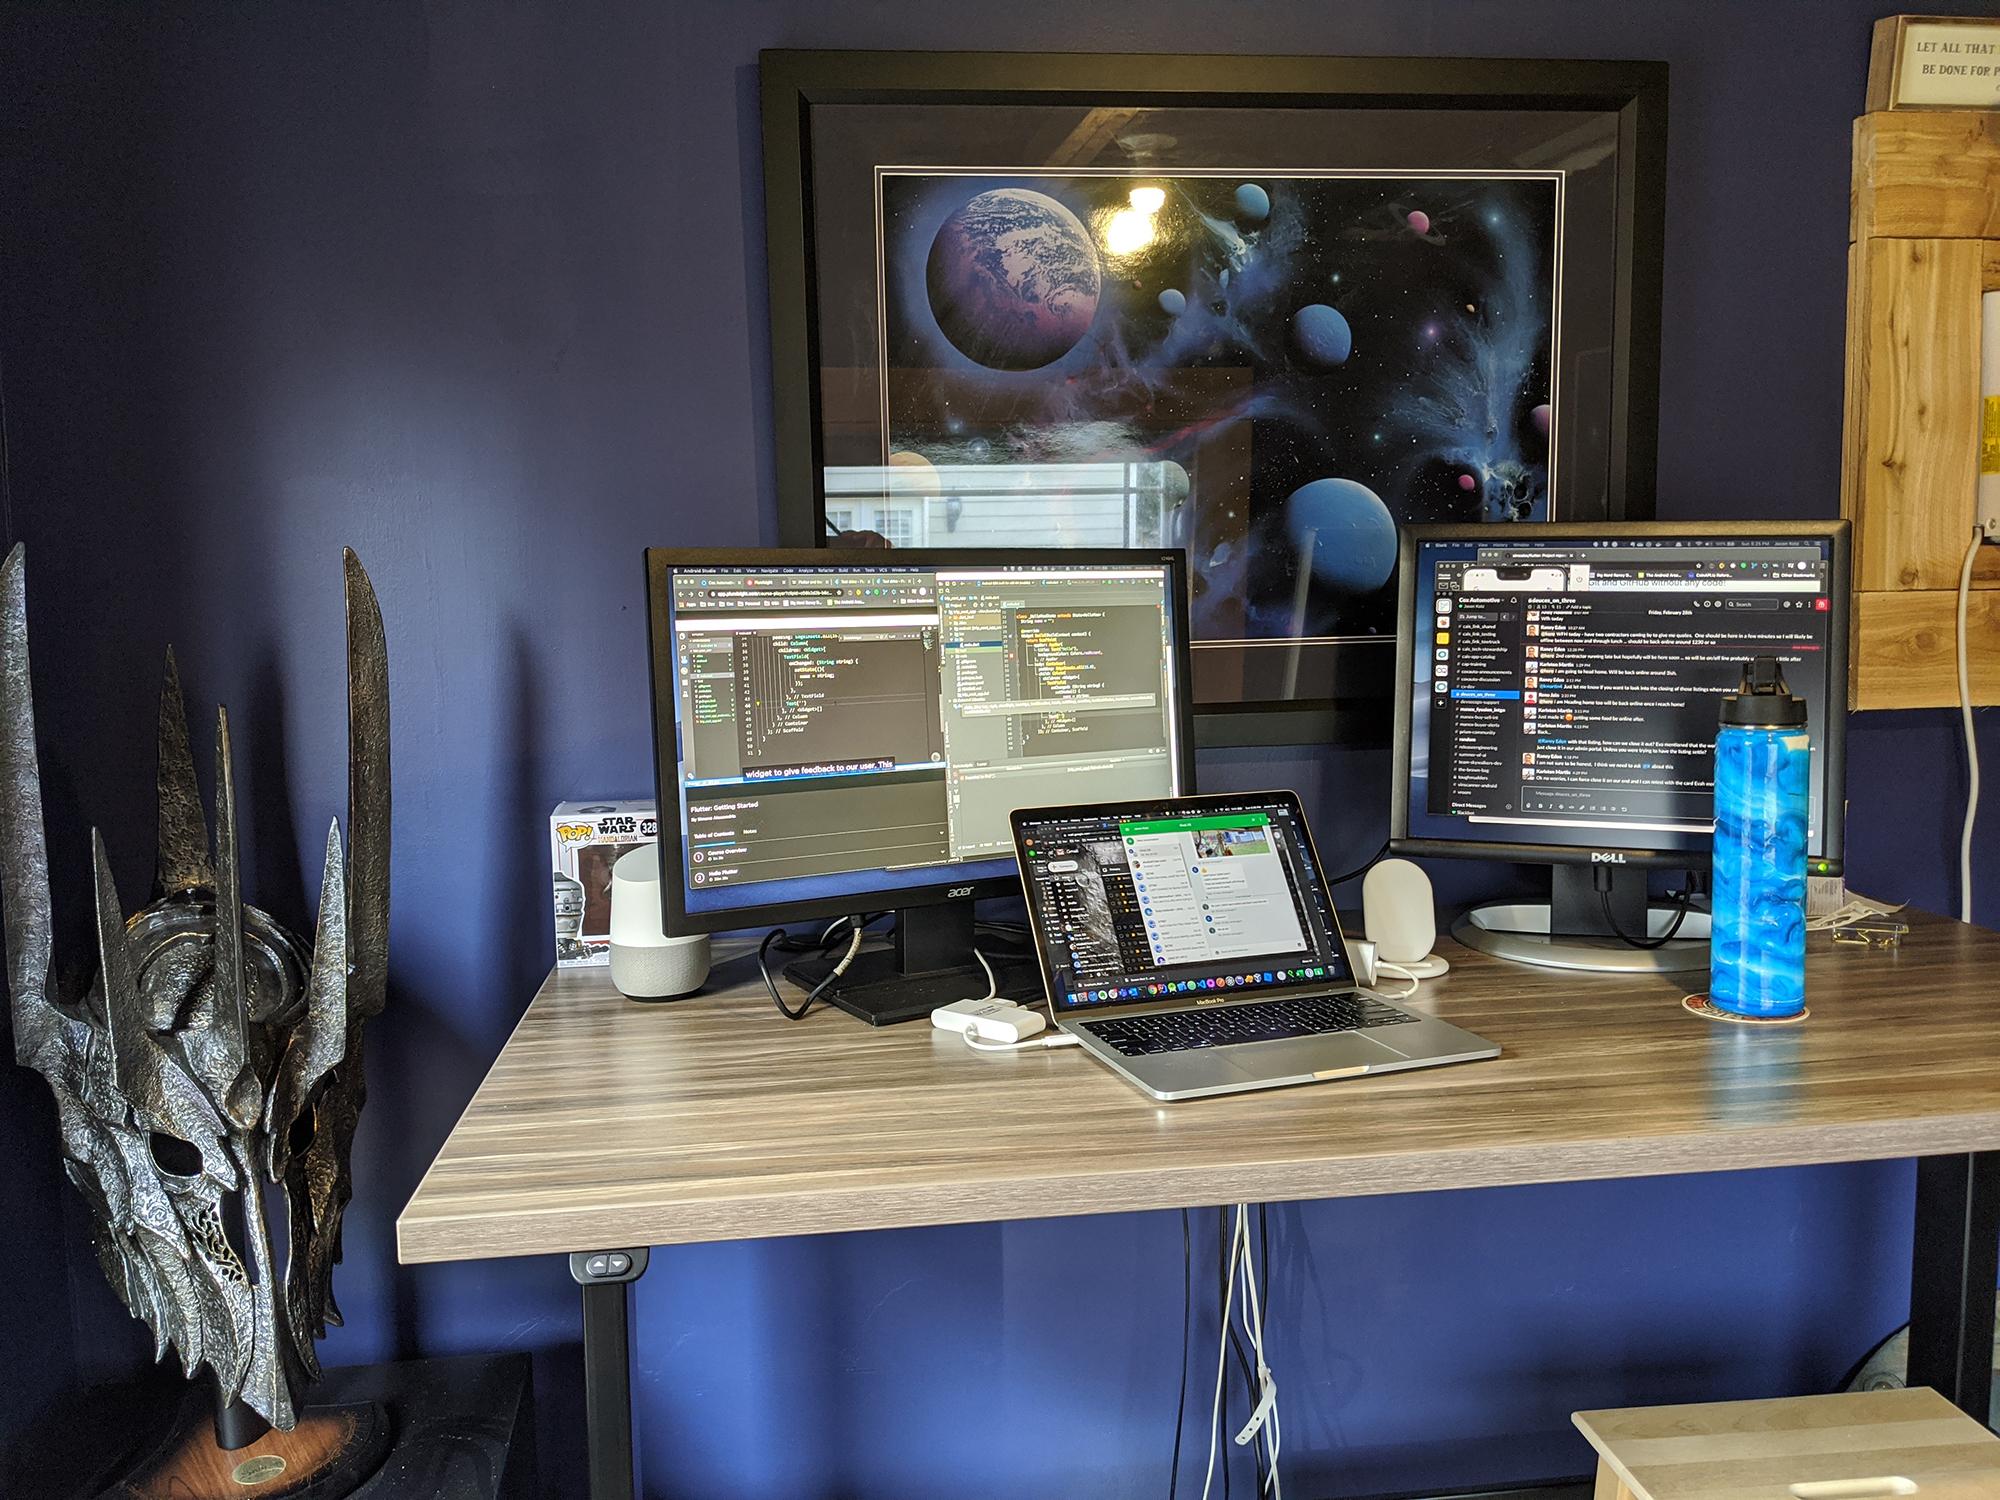 "30"" x 60"" Stromboli Laminate Top with Black VertDesk Adjustable Desk Frame"